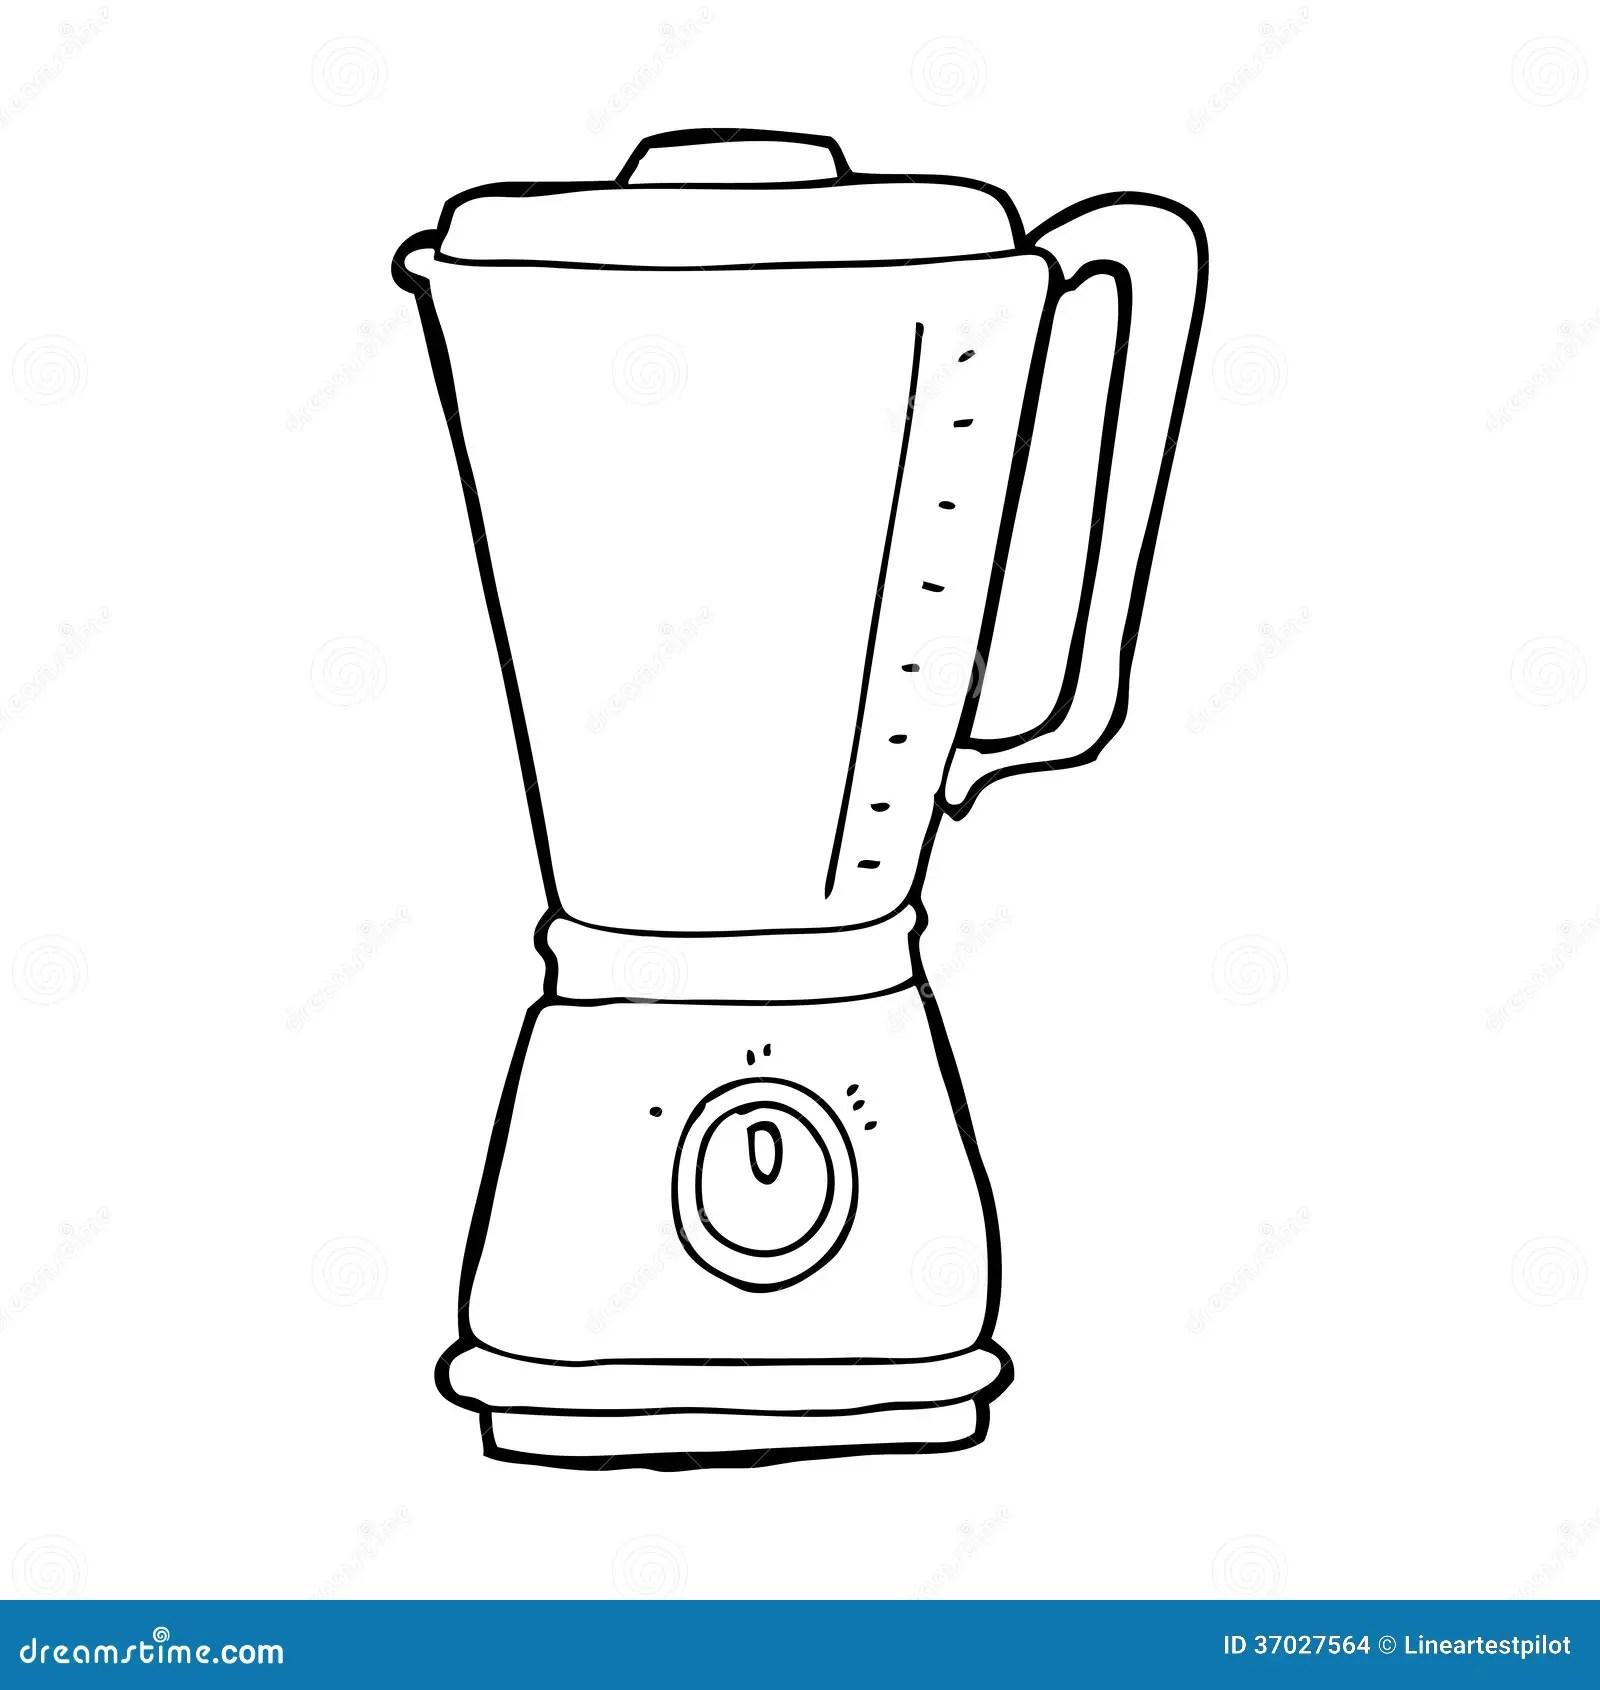 Cartoon kitchen blender stock illustration. Image of funny